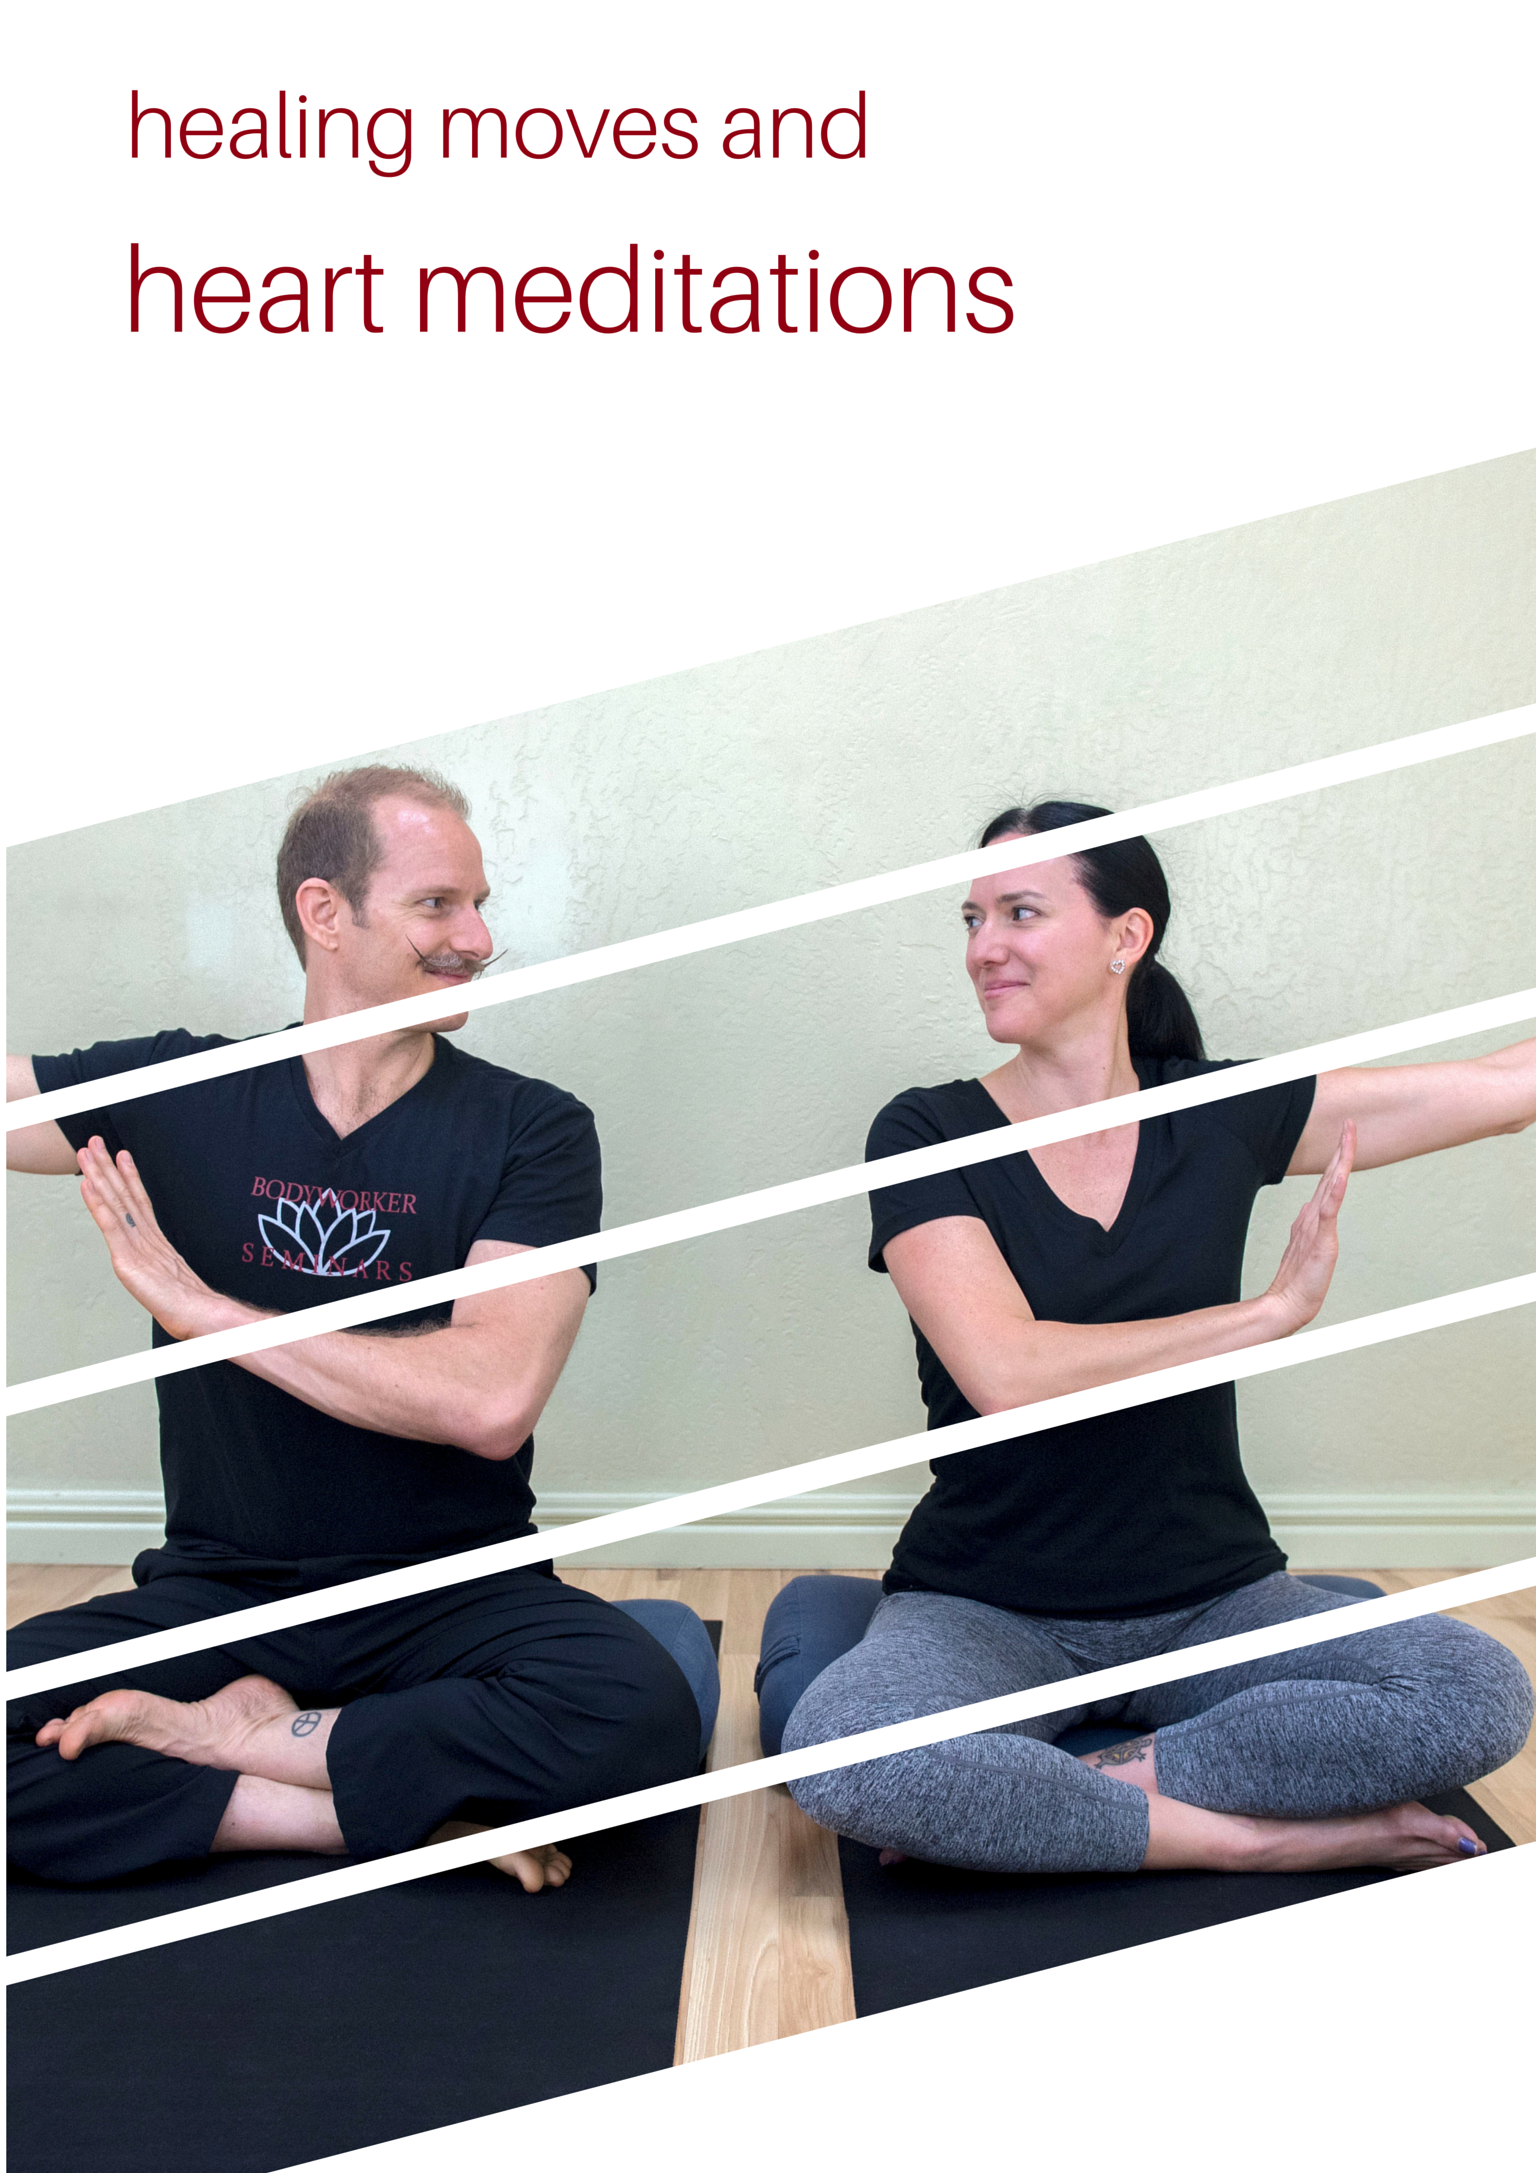 Healing Moves and Heart Meditations